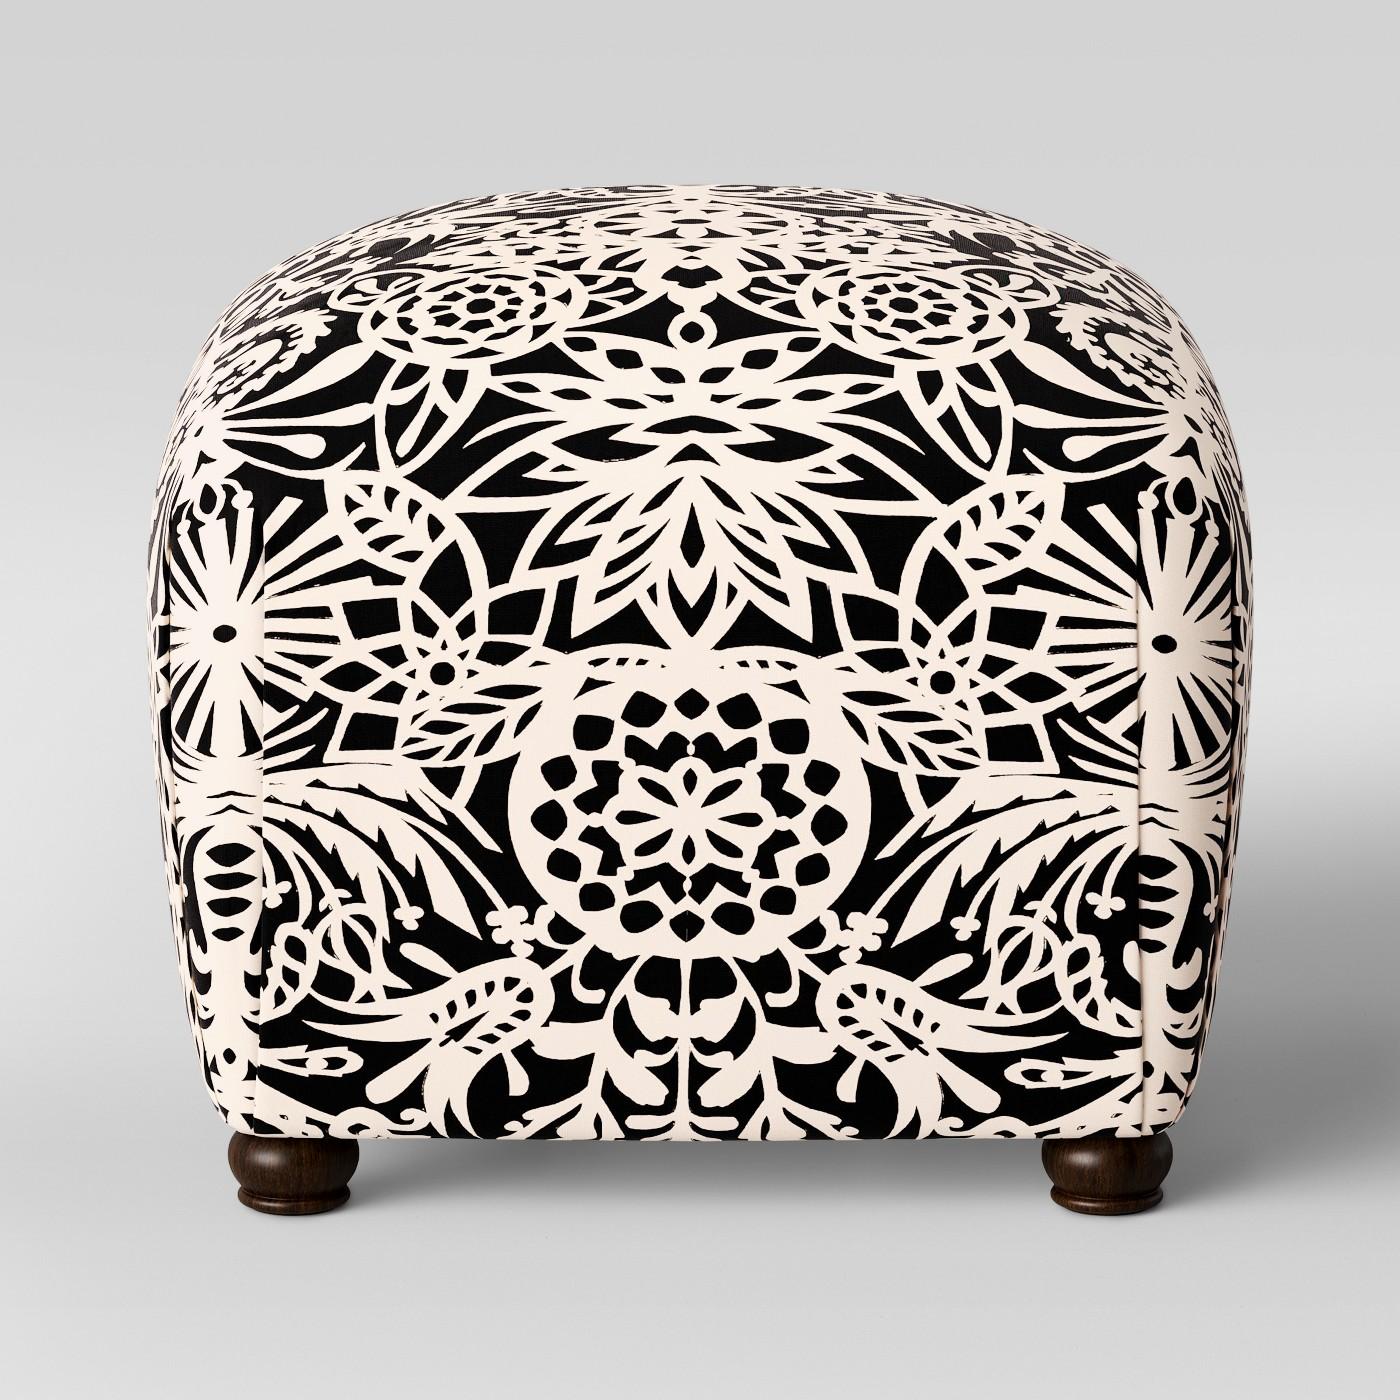 Poppy Ottoman Black & White Floral - Opalhouse™ - image 1 of 3